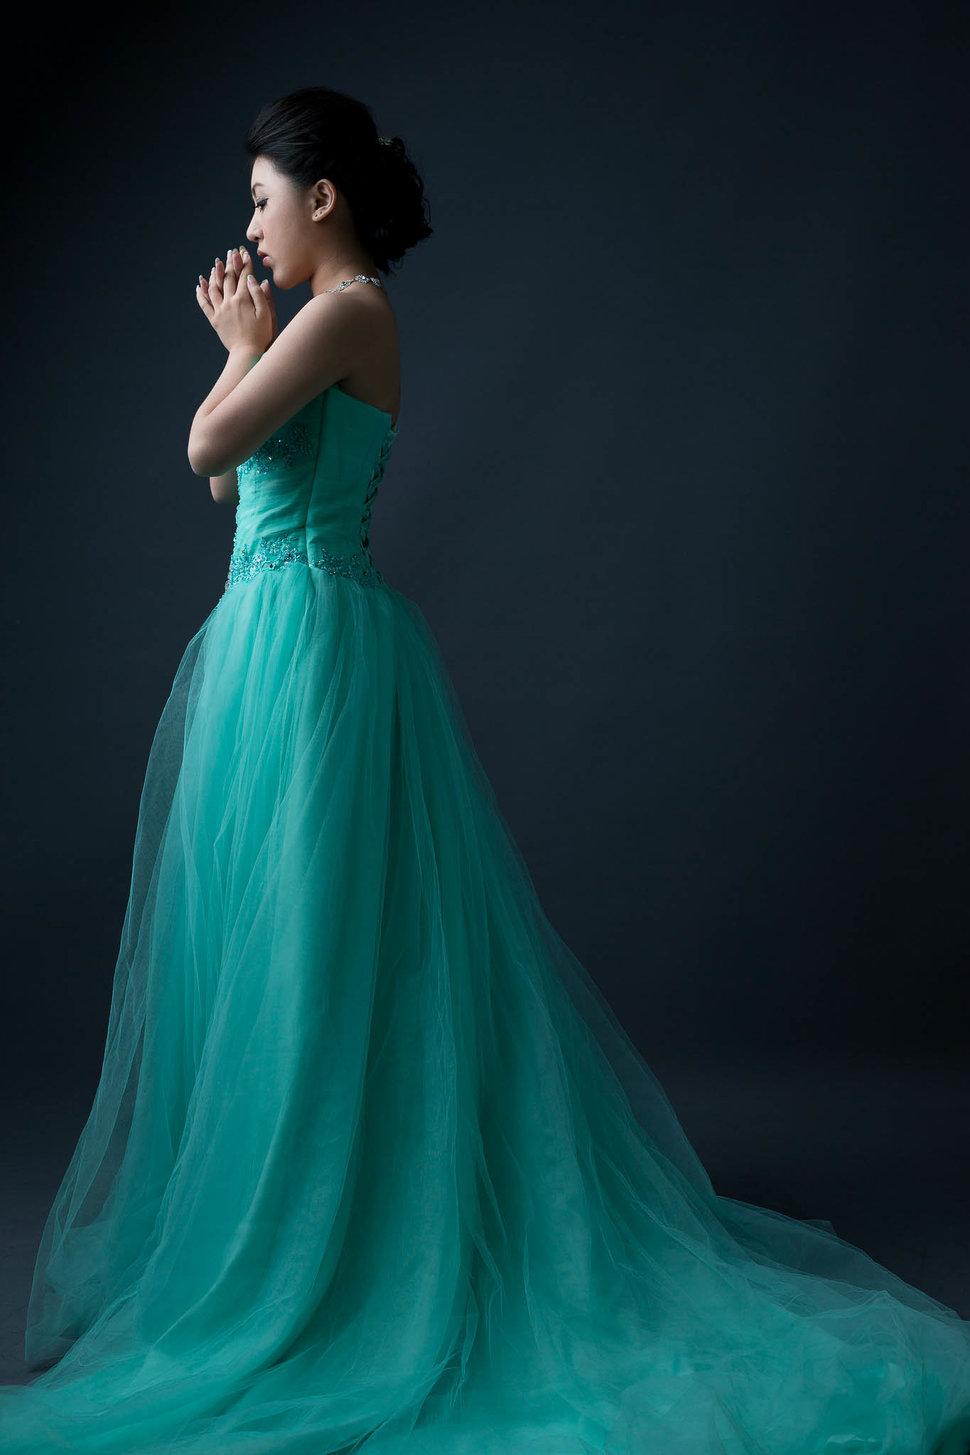 18PHOTO自主婚紗-深邃(編號:214886) - 18PHOTO 婚紗影像攝影工作室 - 結婚吧一站式婚禮服務平台